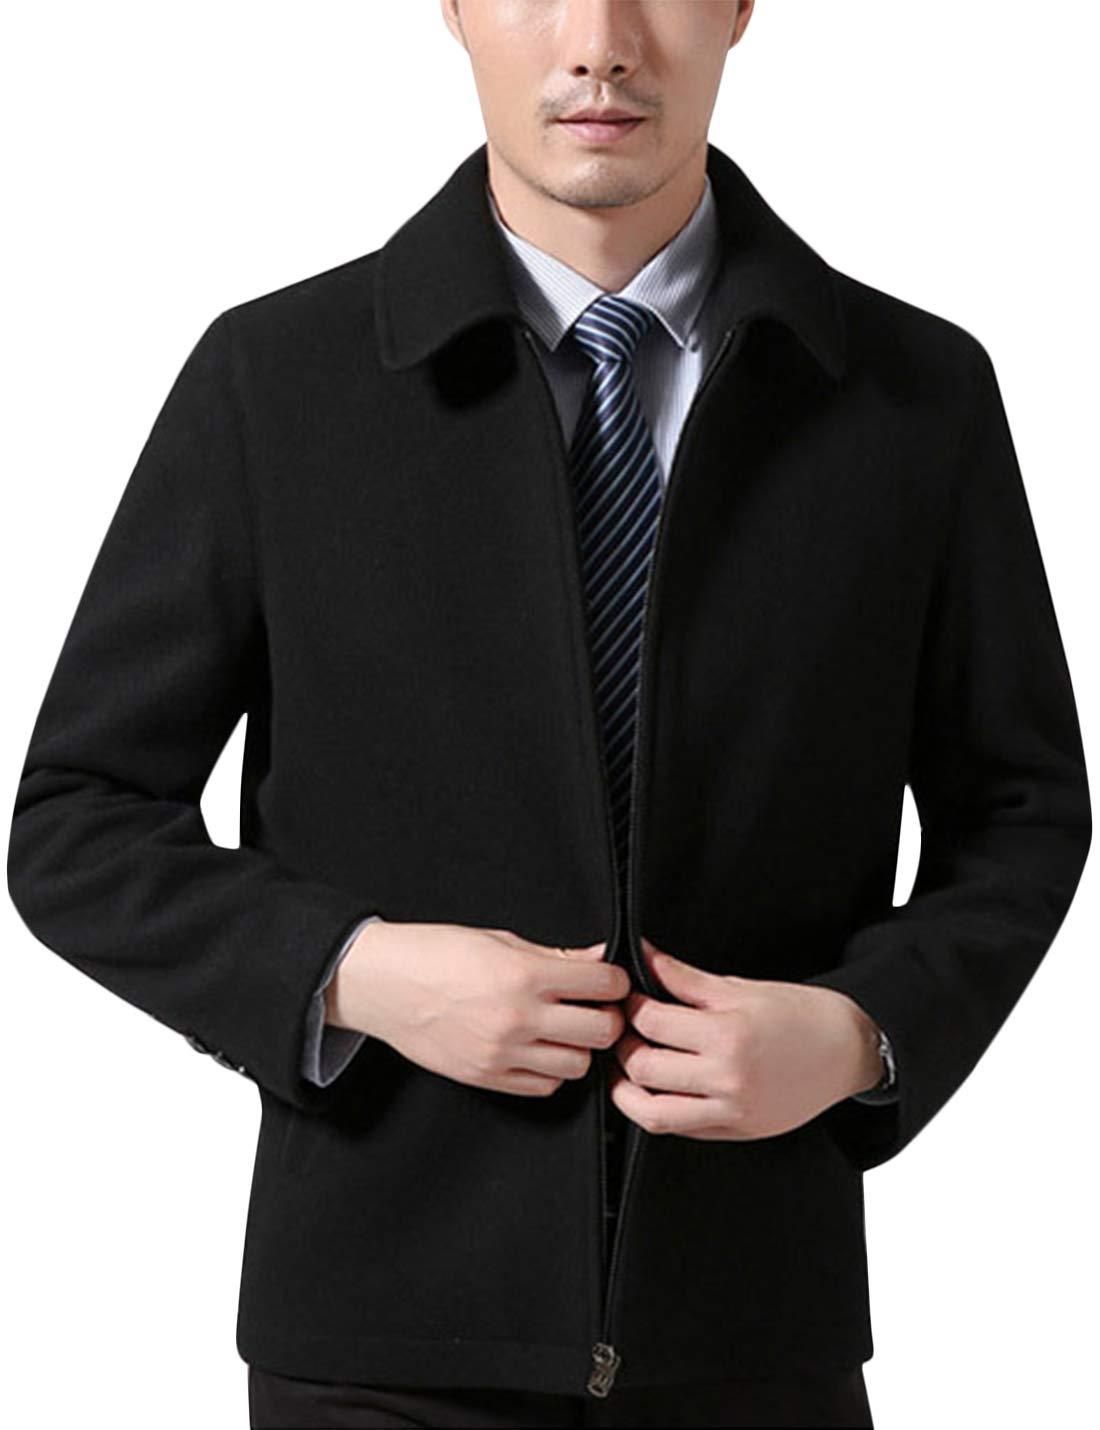 Tanming Mens Autumn Fashion Classic Lapel Zip up Wool Blend Short Coat Warm Jacket (Black, Medium)